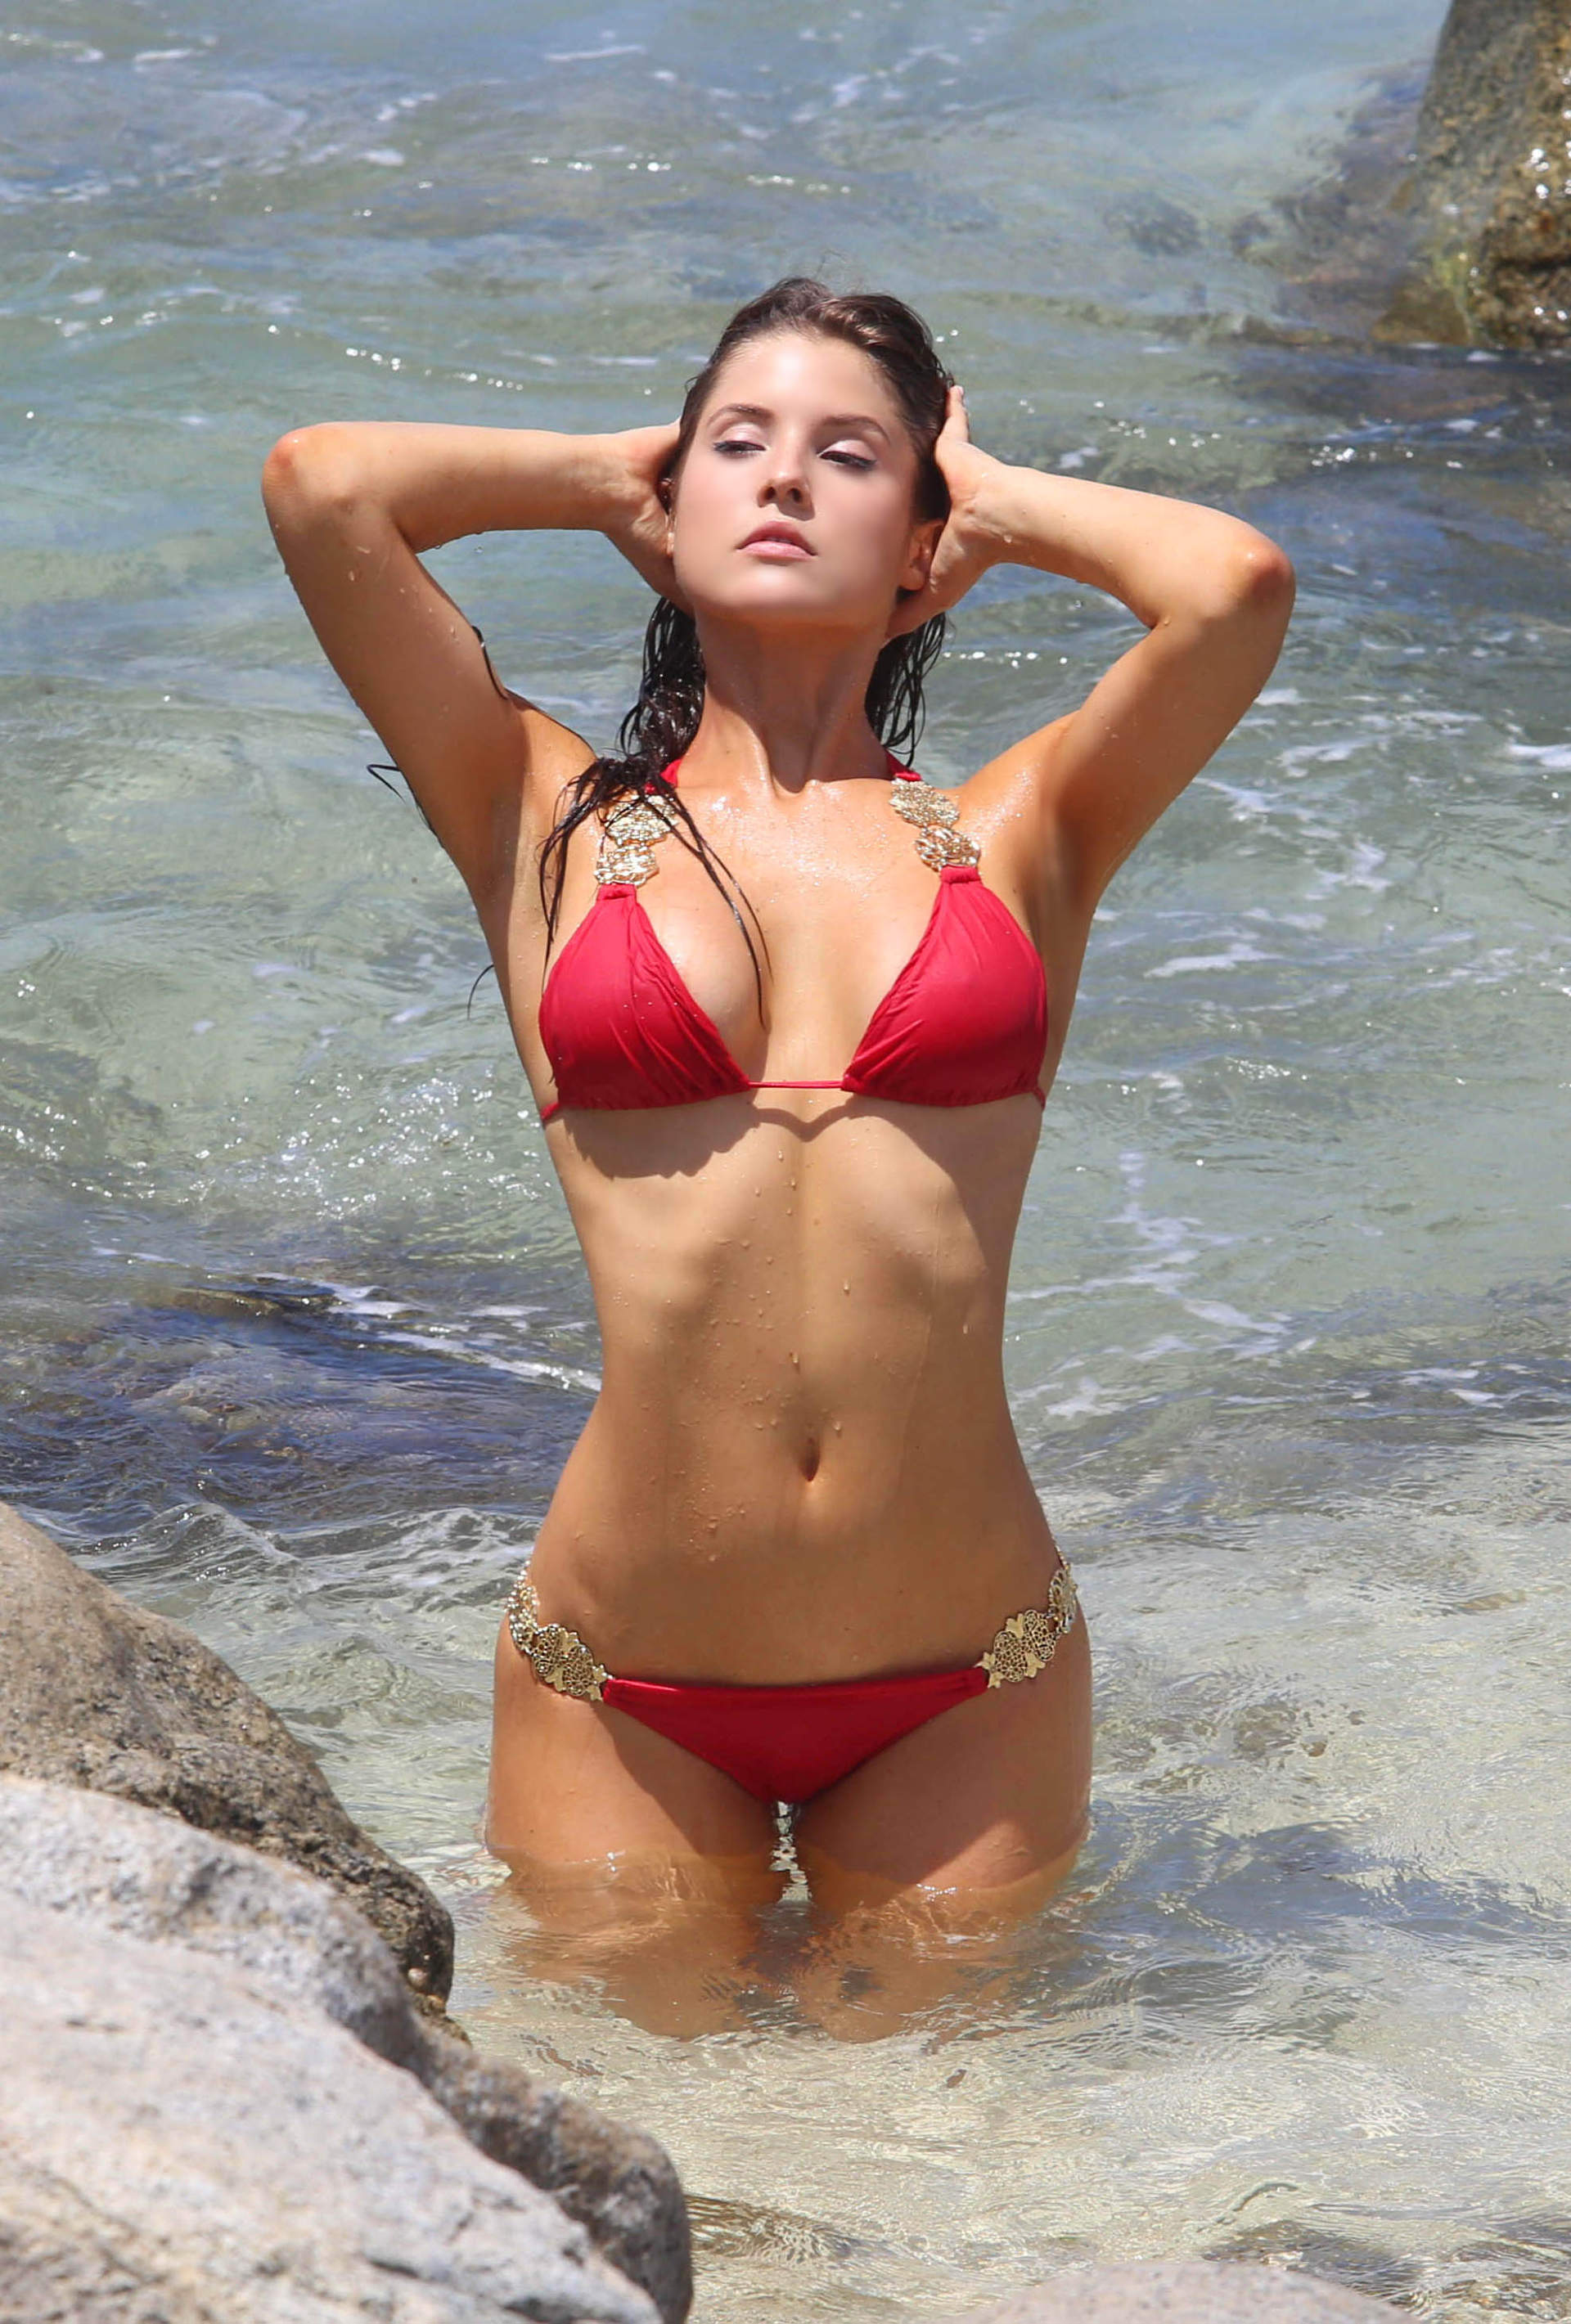 Amanda Cerny Shows Off Her Bikini Body On The Set Of A